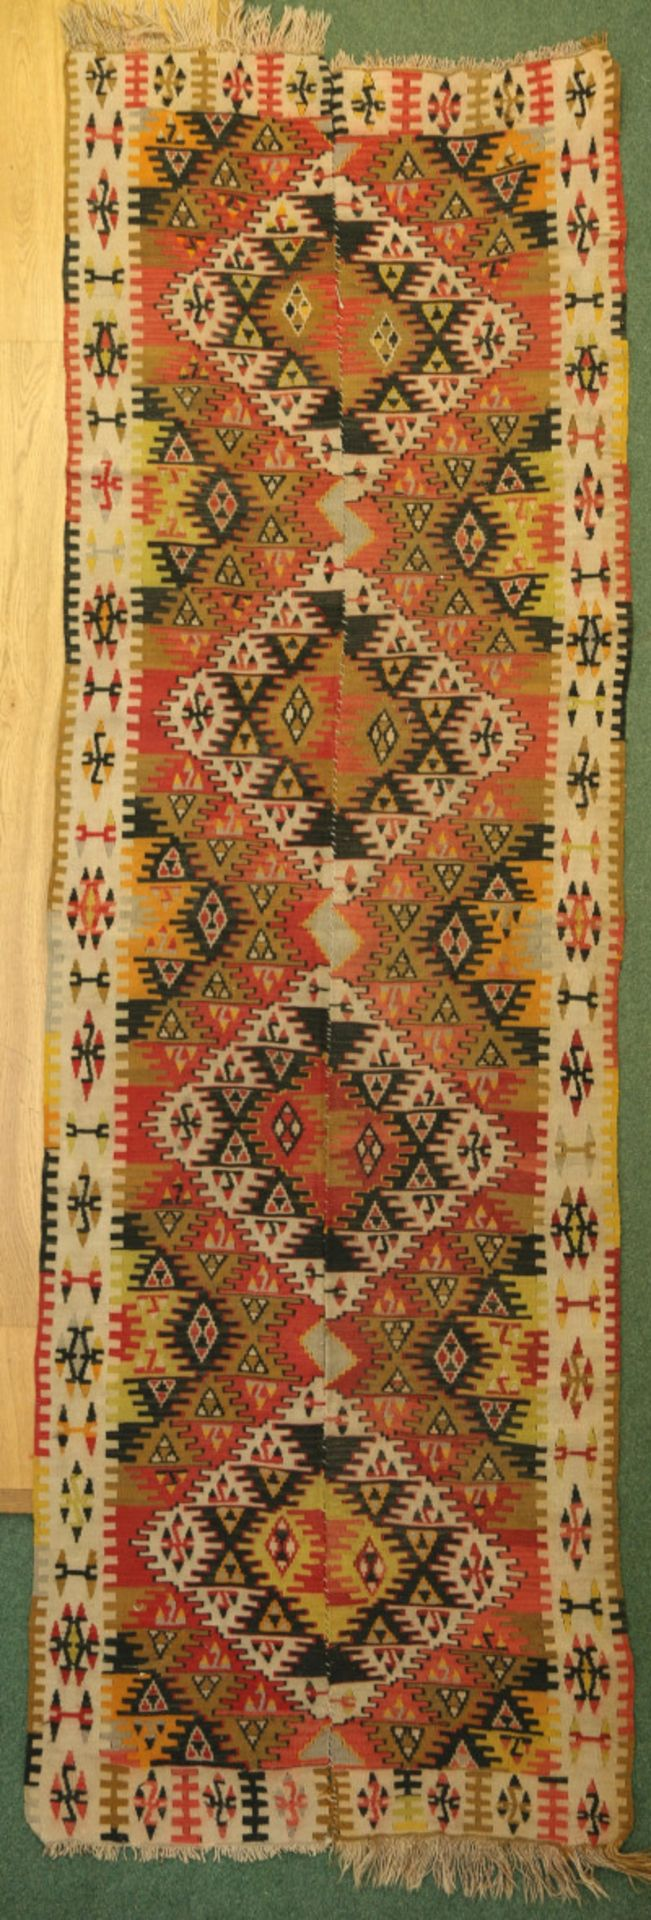 Anatolische kelim kleed, ca. 1930